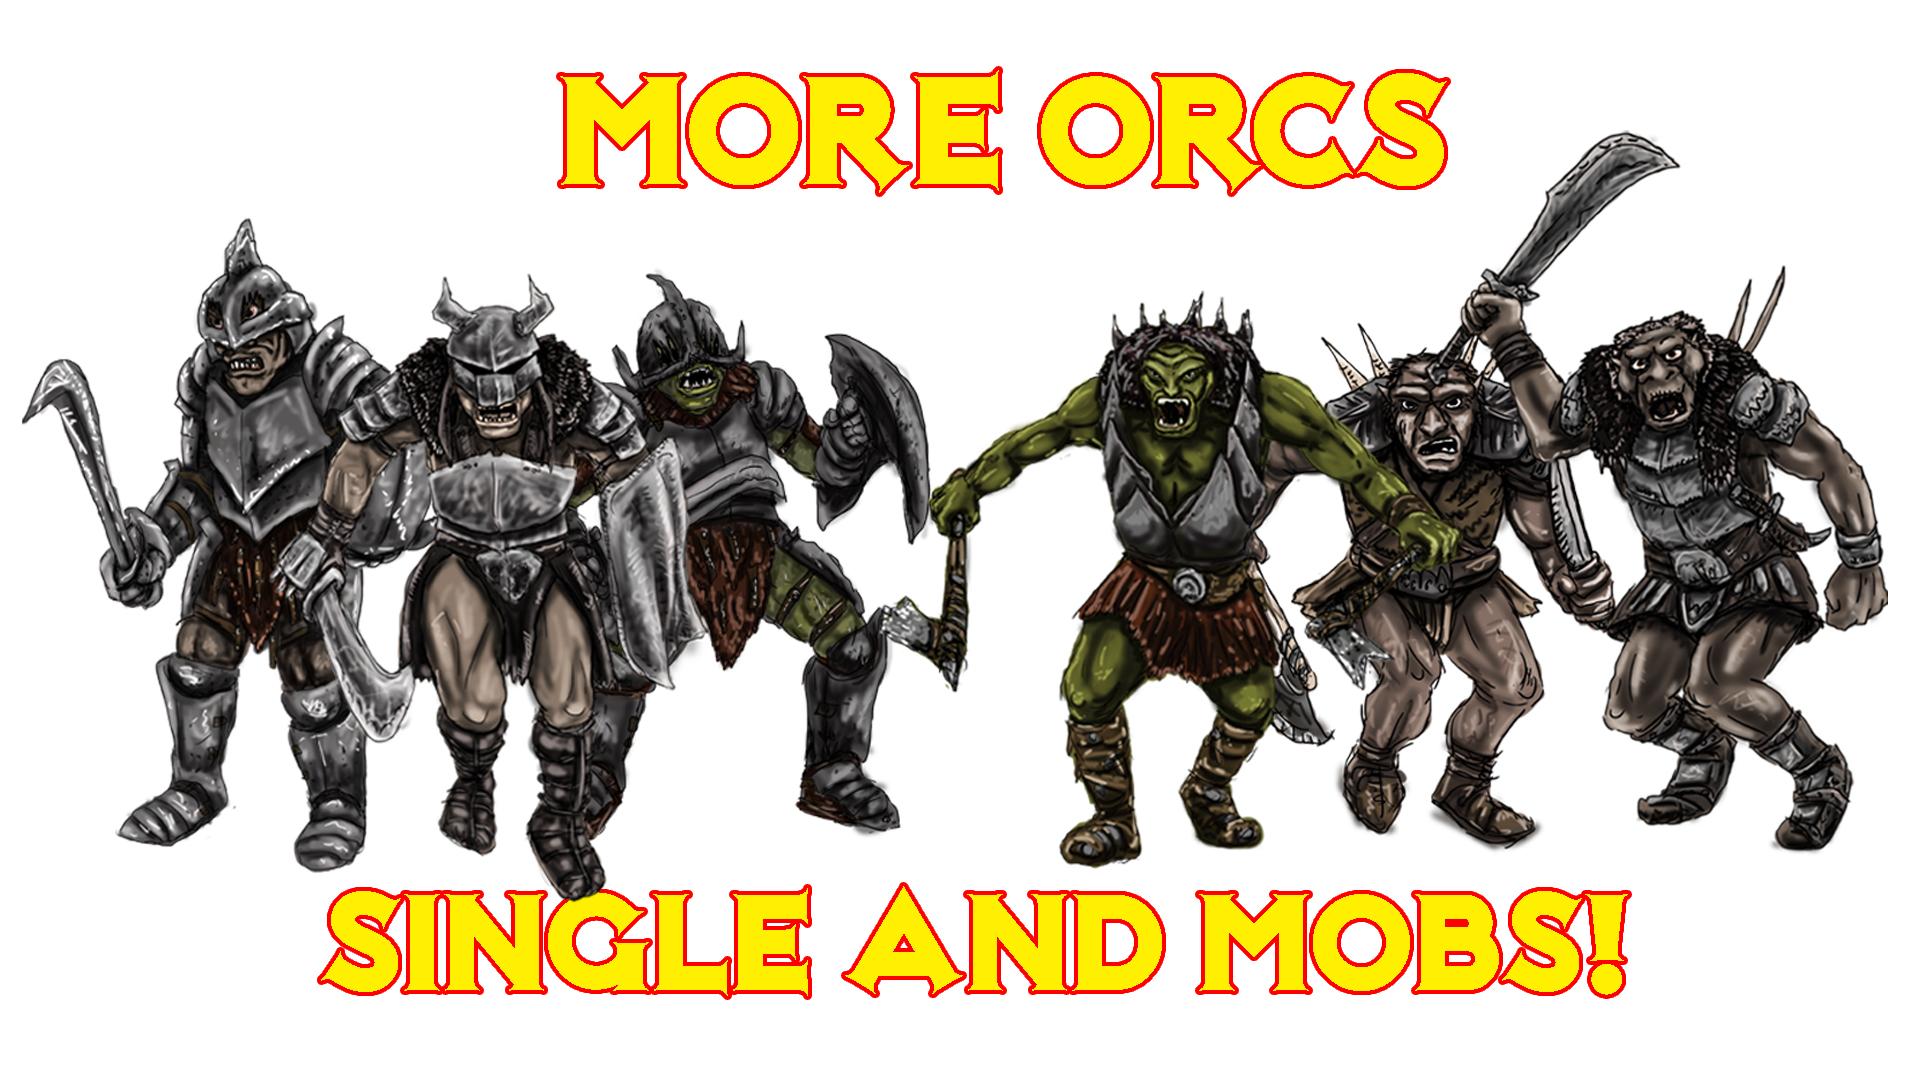 018 More Orcs